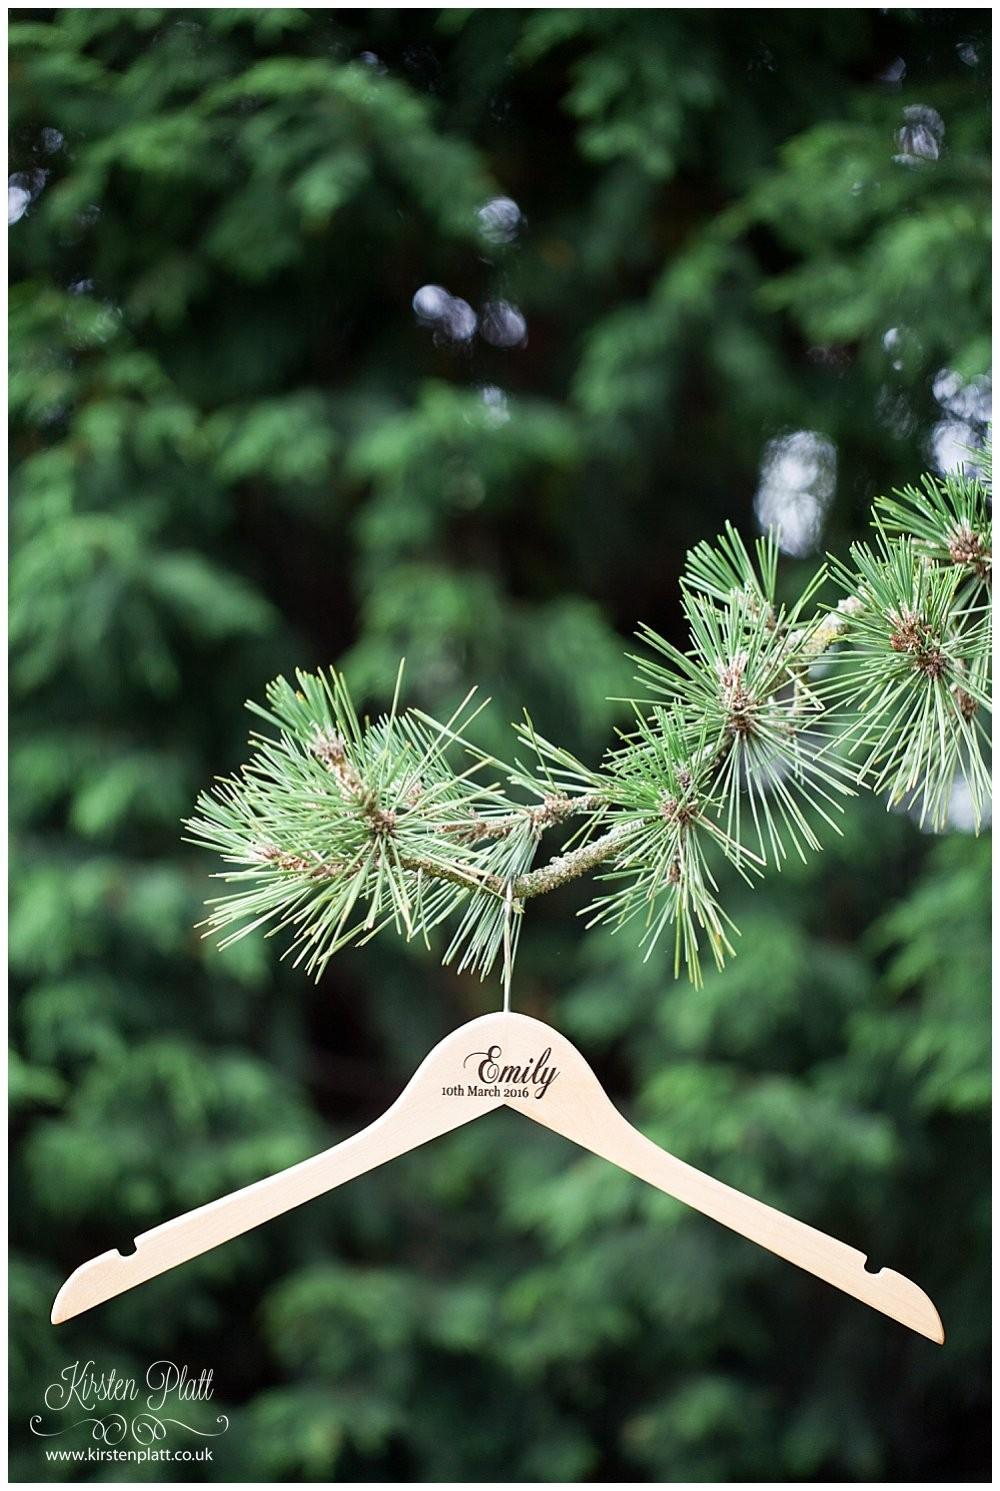 Bespoke and Oak Co personalised coat hangers